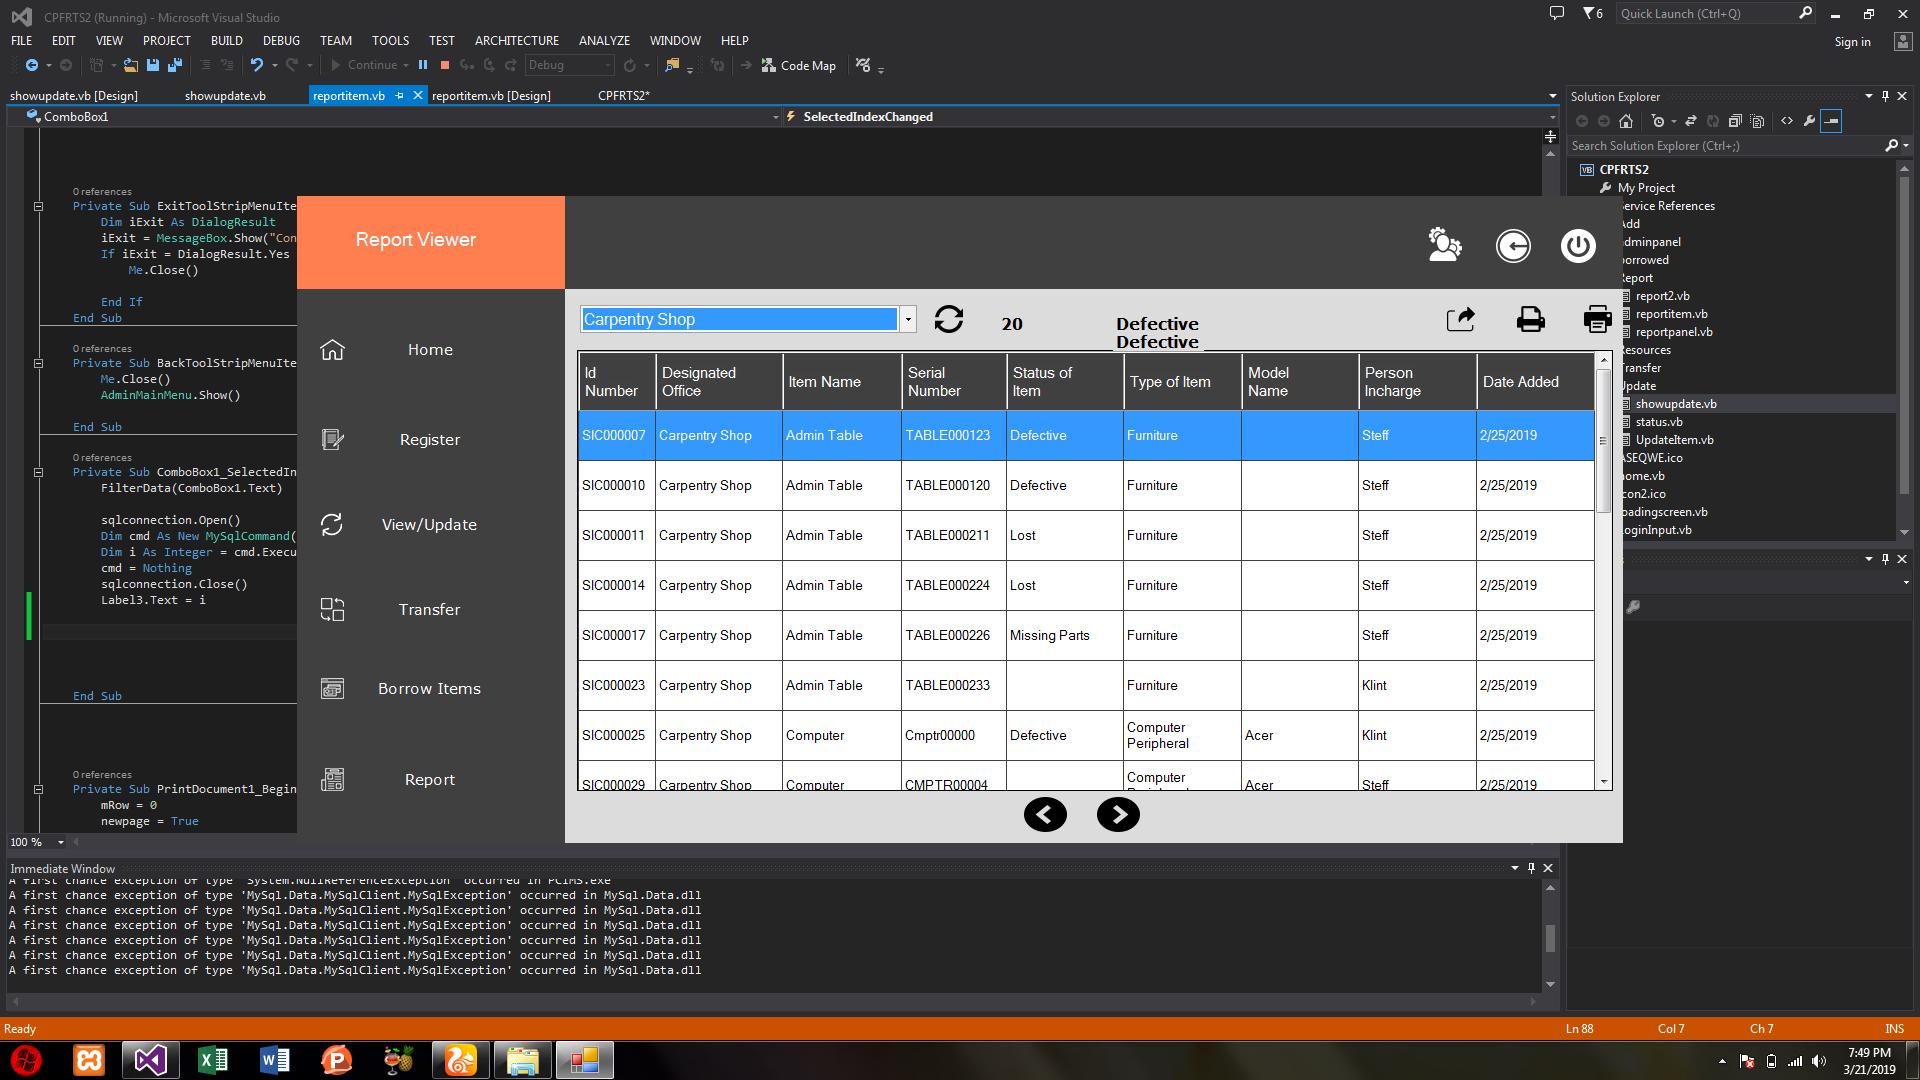 Avocode 4.4.6 Crack Full Torrent 2020 Download For [Mac/Win/Linux]